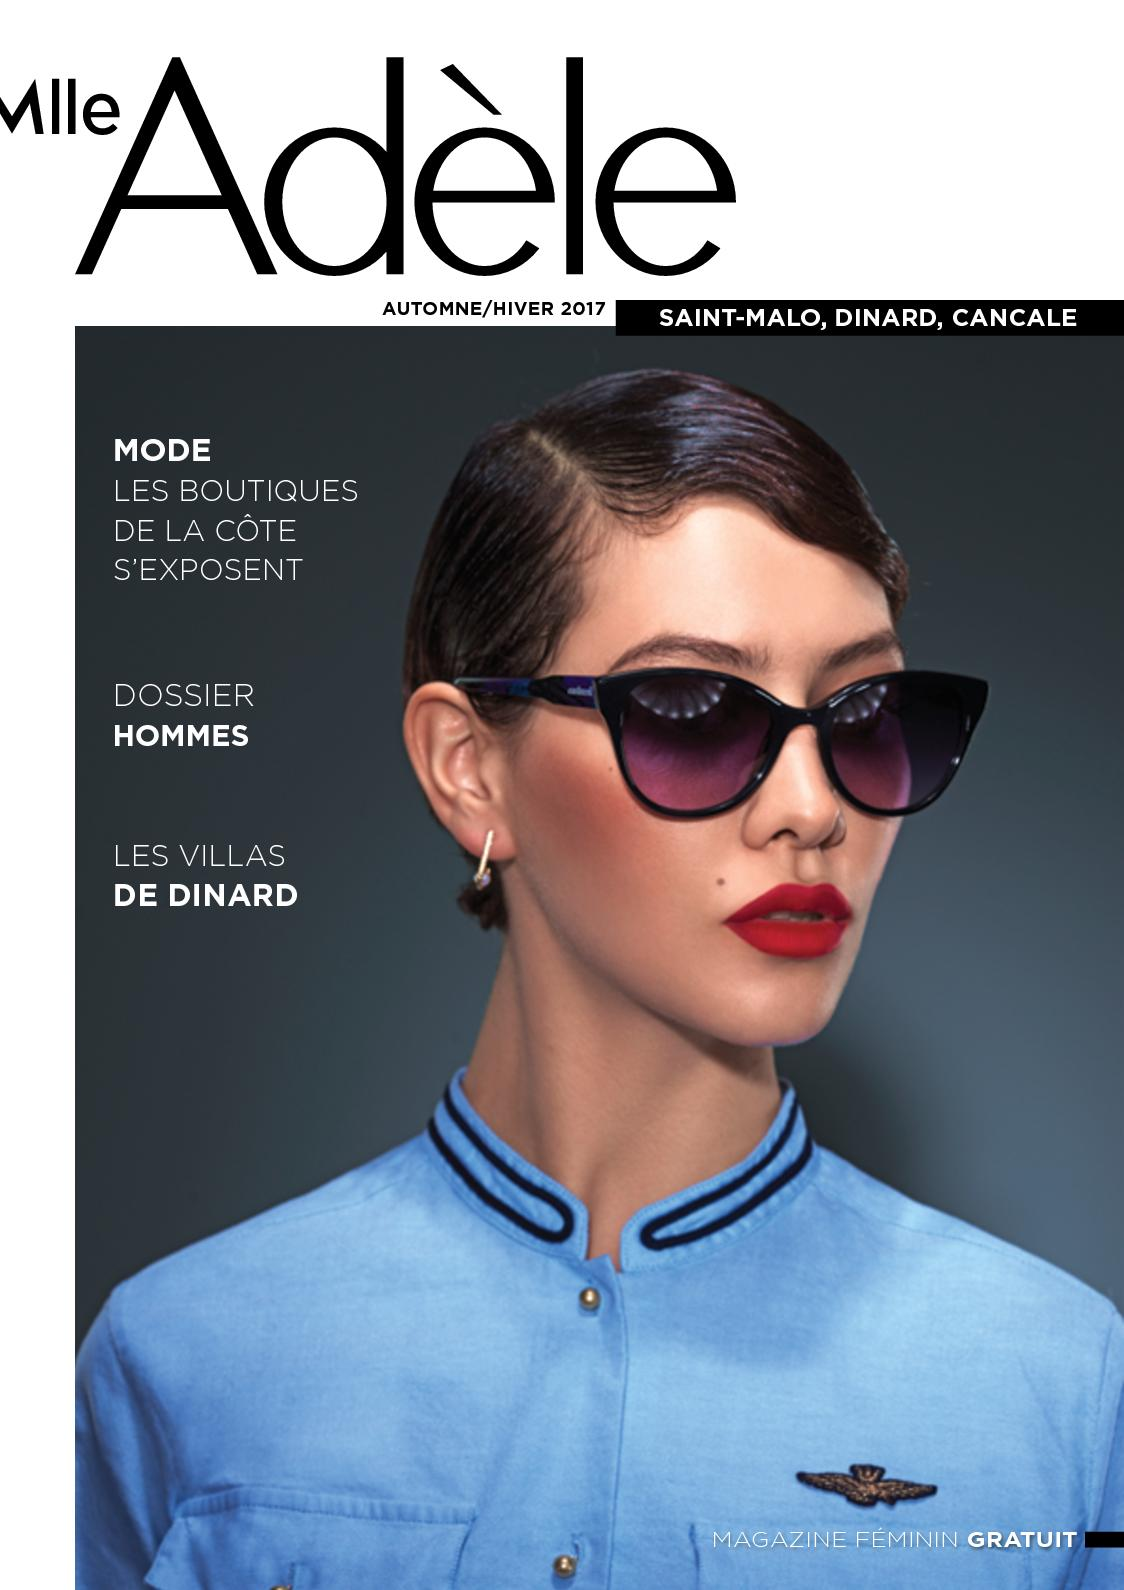 Calaméo - Magazine Mlle Adèle Côte D emeraude N°8 e4029bf65706